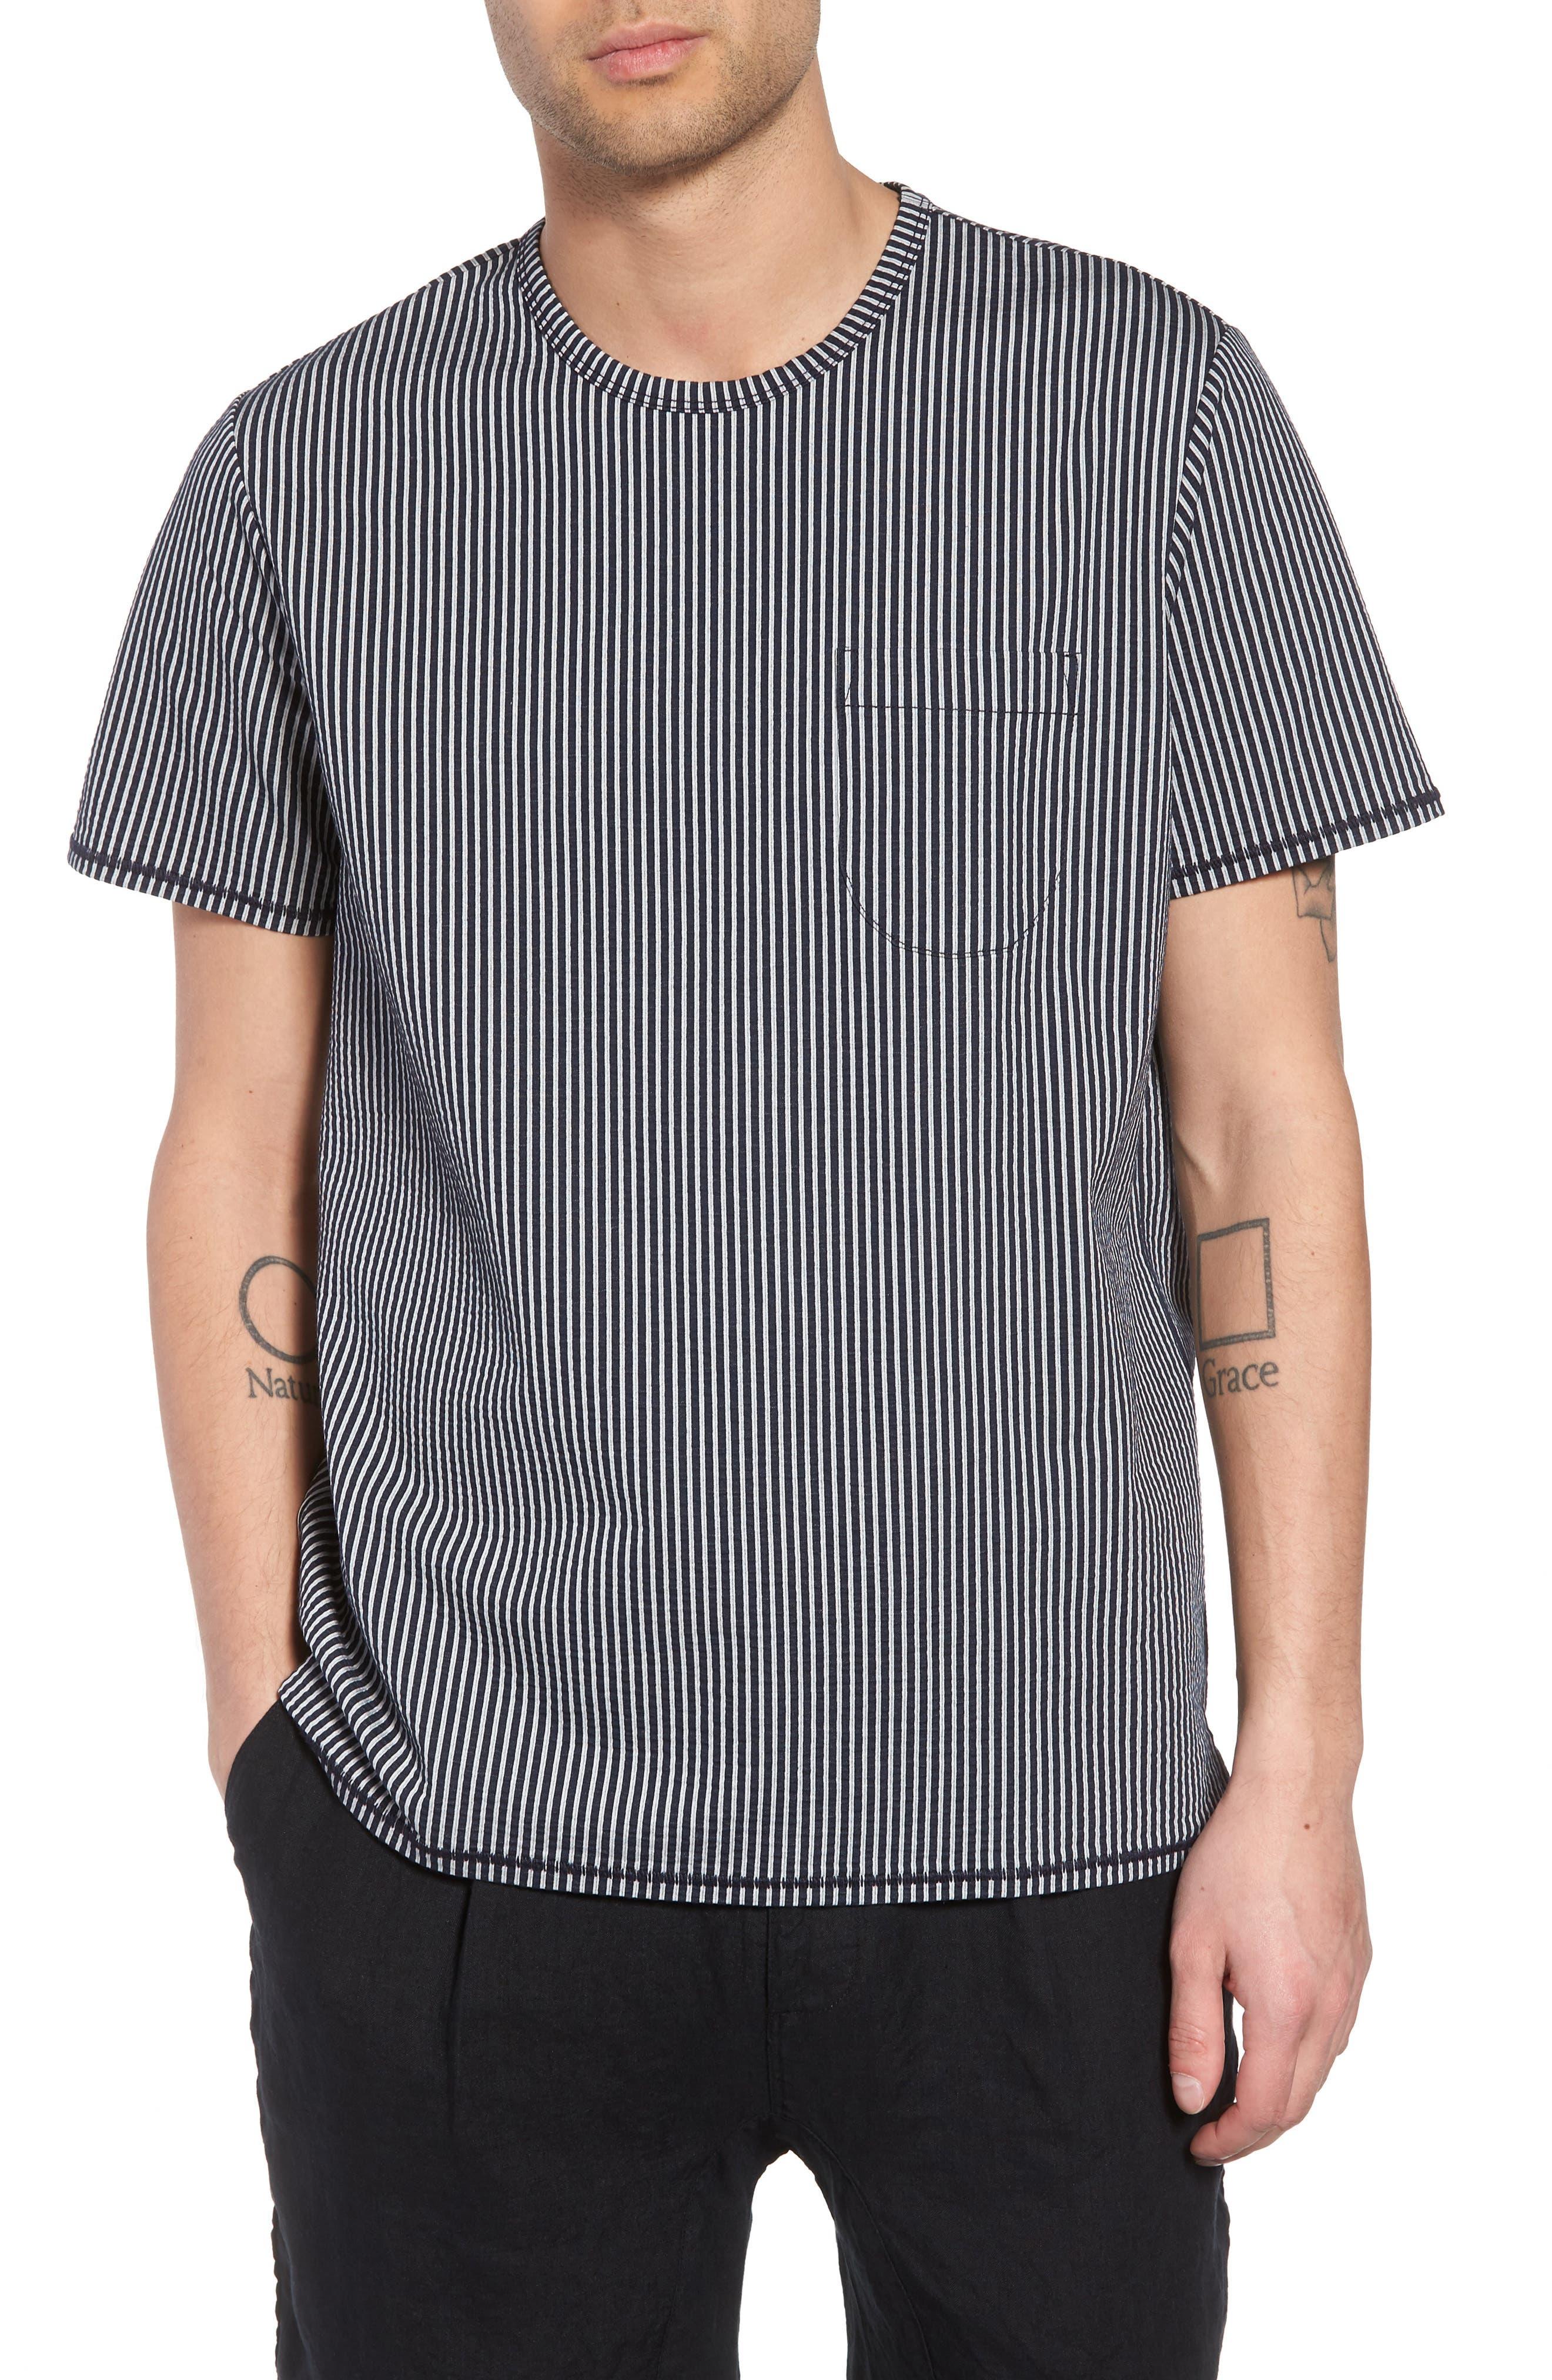 Treasure & Bond Japanese Seersucker T-Shirt